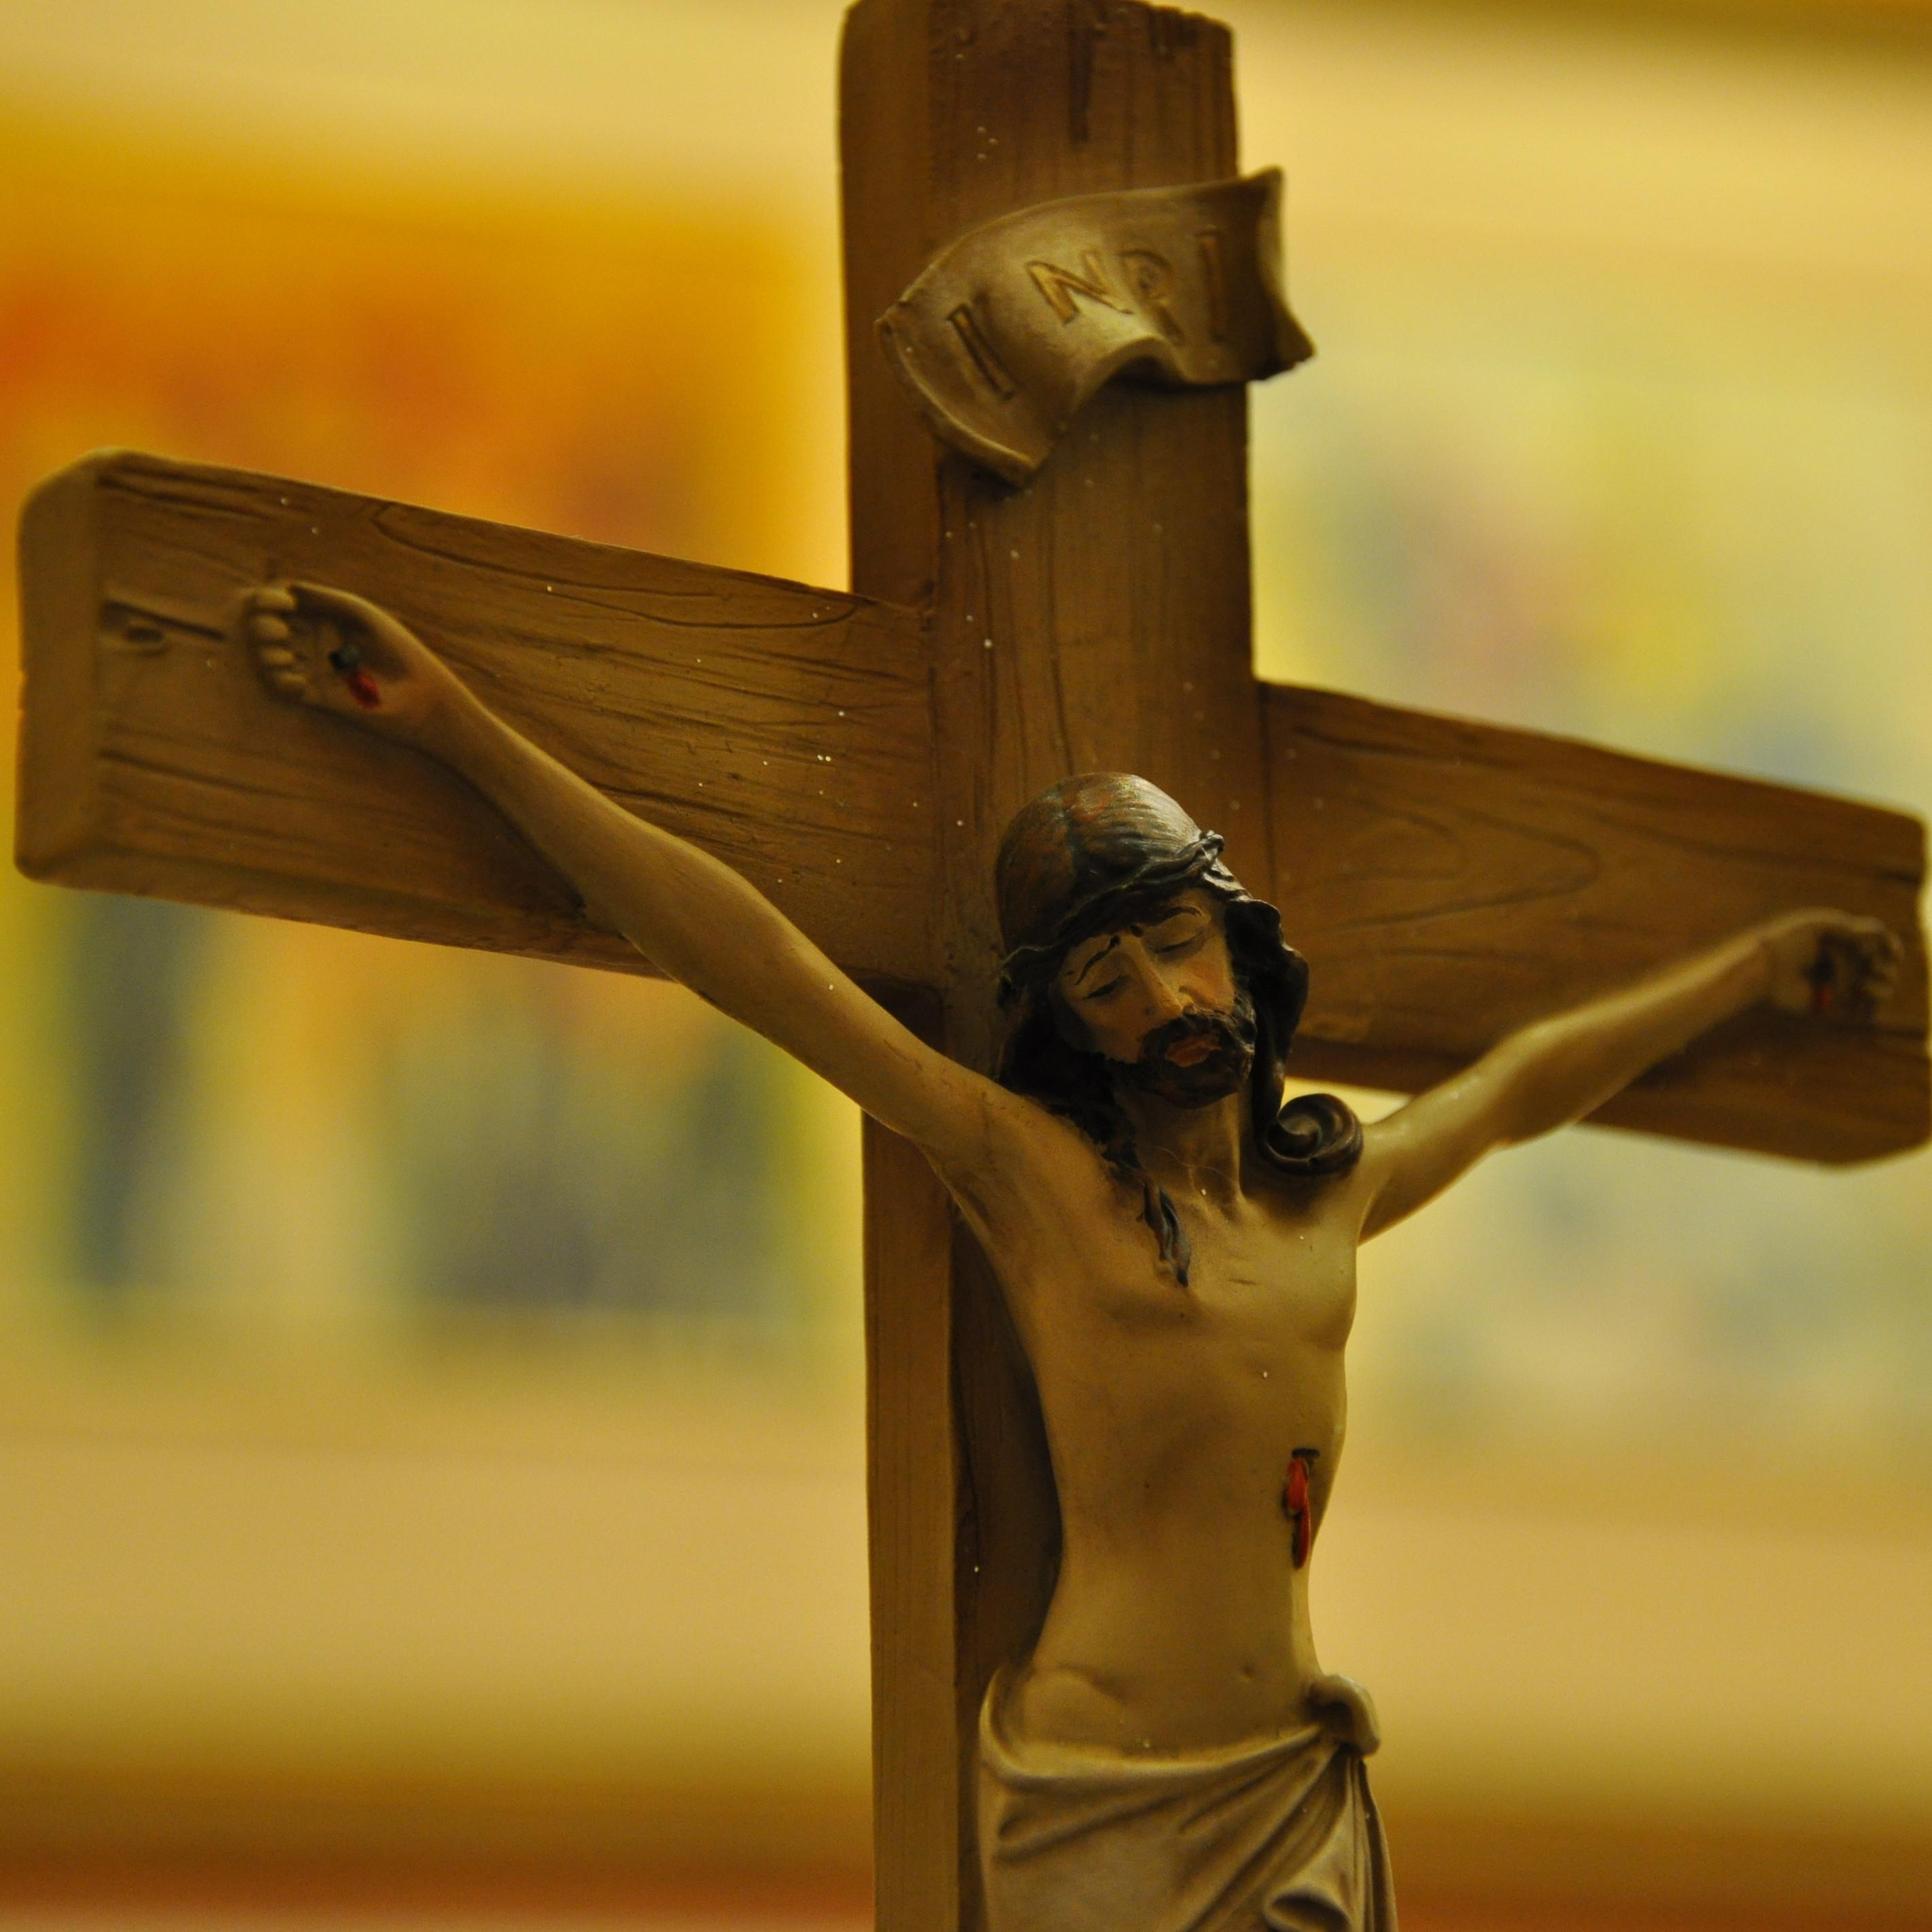 Христианские сувениры Bealife 2180500